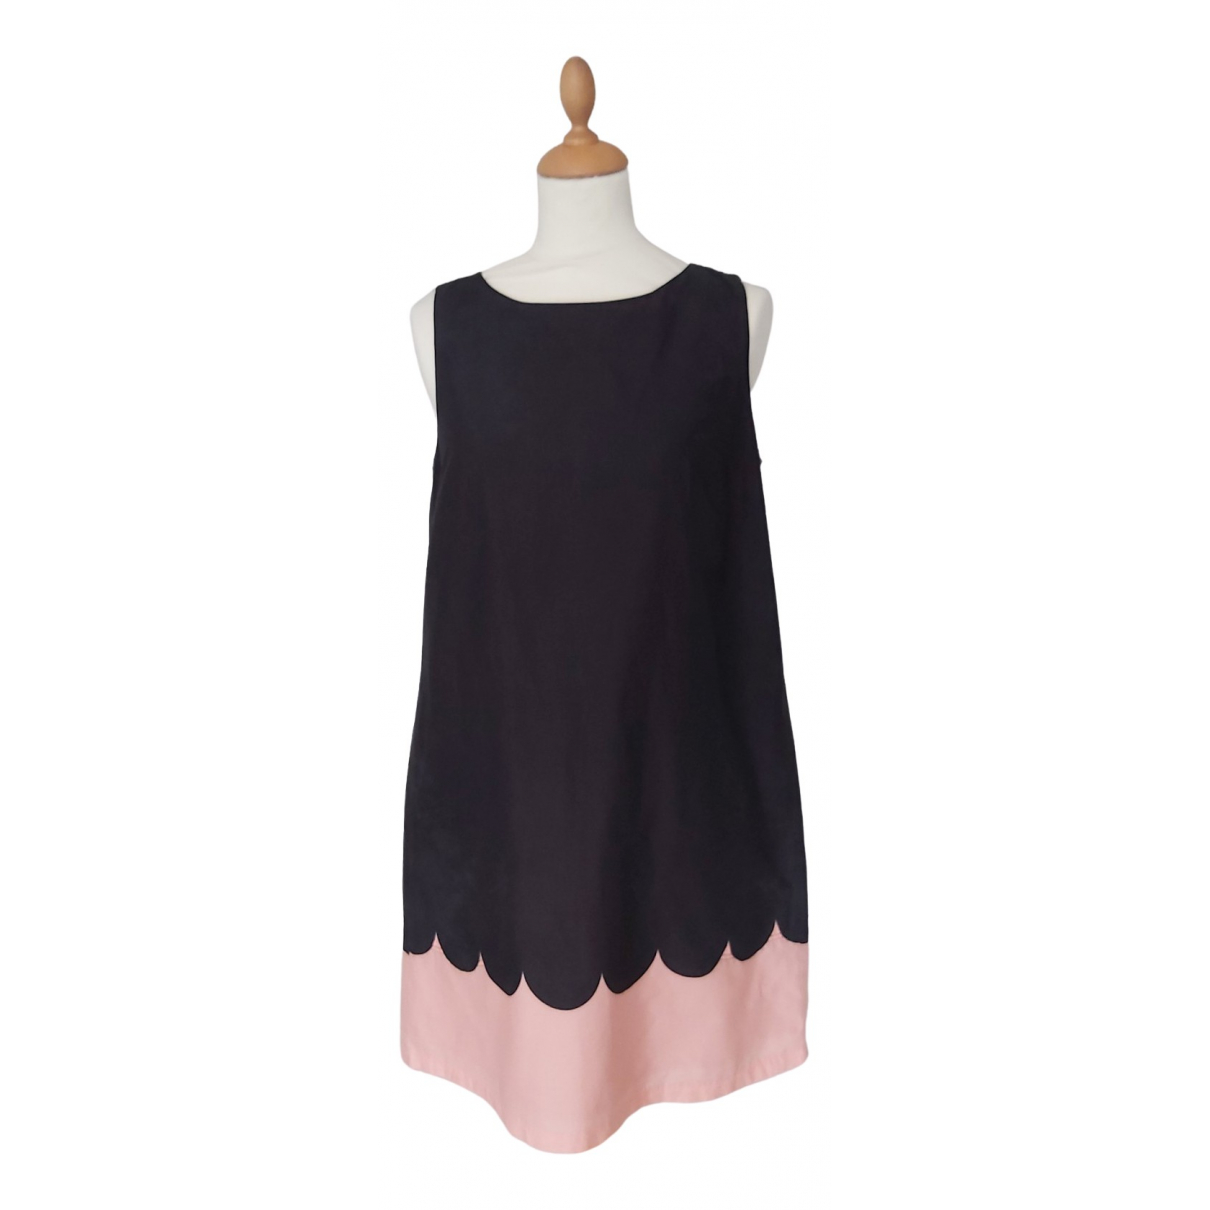 Marimekko \N Black Cotton dress for Women 38 FR